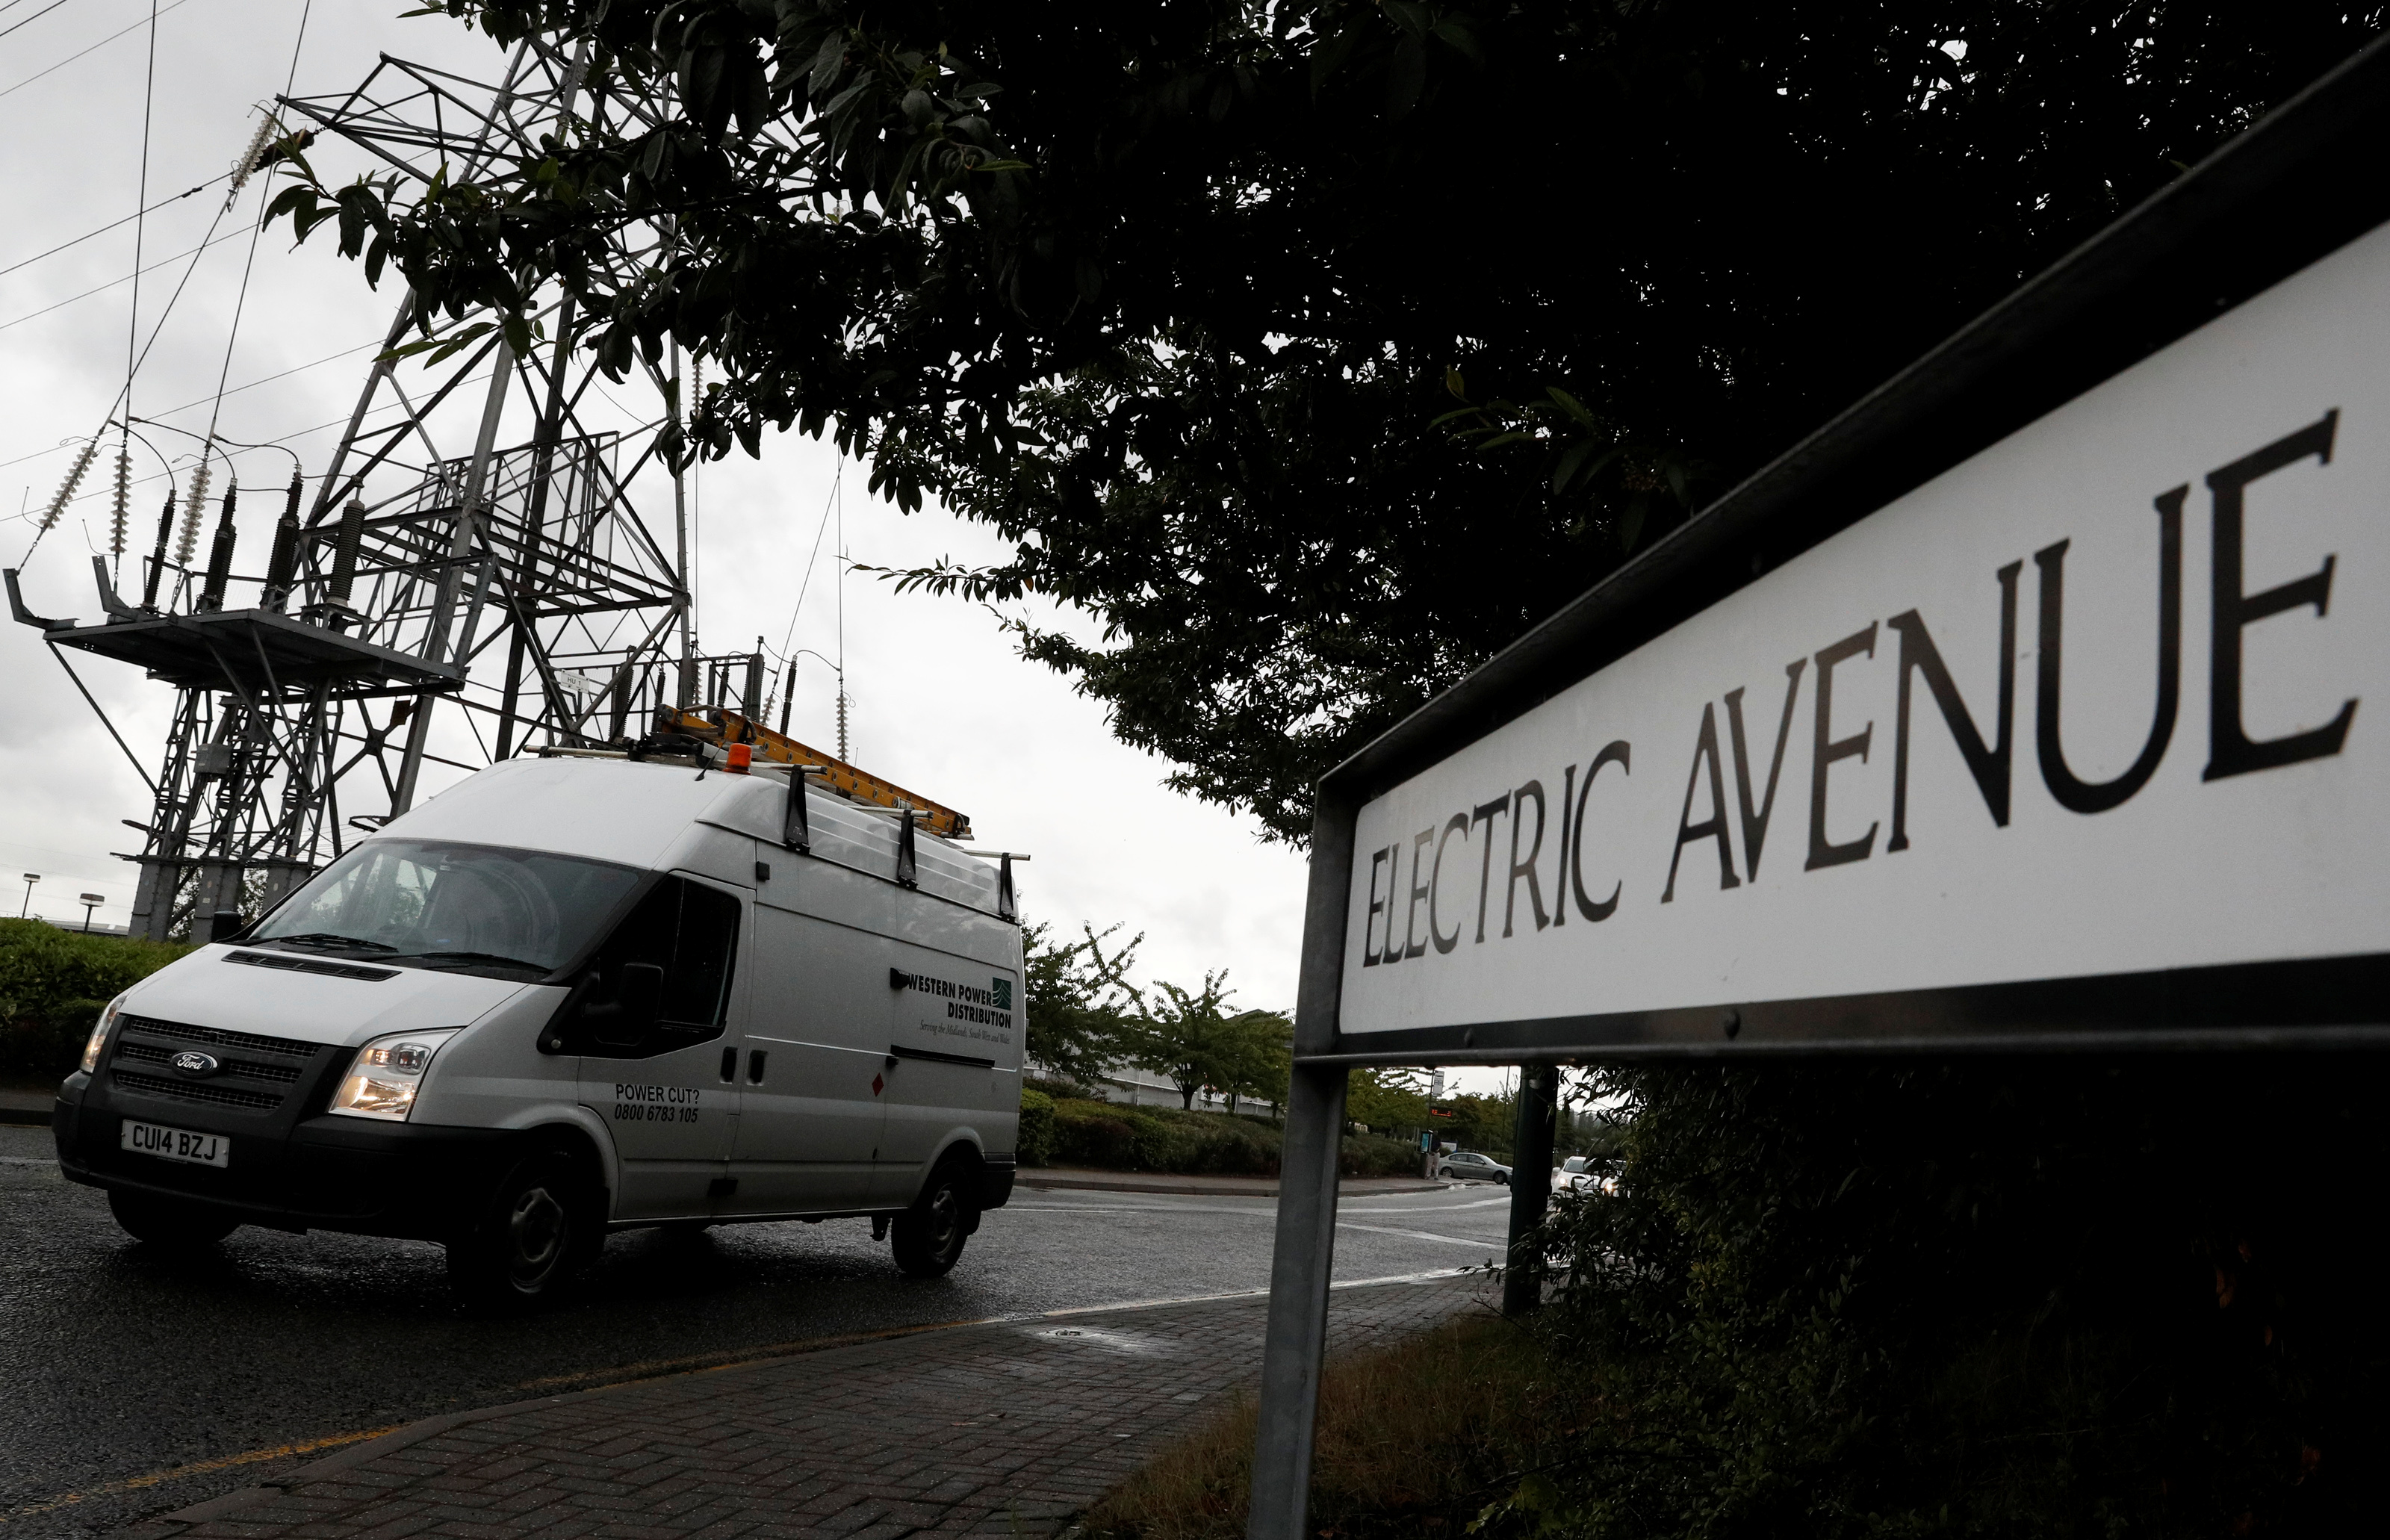 A Western Power Distribution van is driven along Electric Avenue in Nottingham, Britain August 8, 2017. REUTERS/Darren Staples